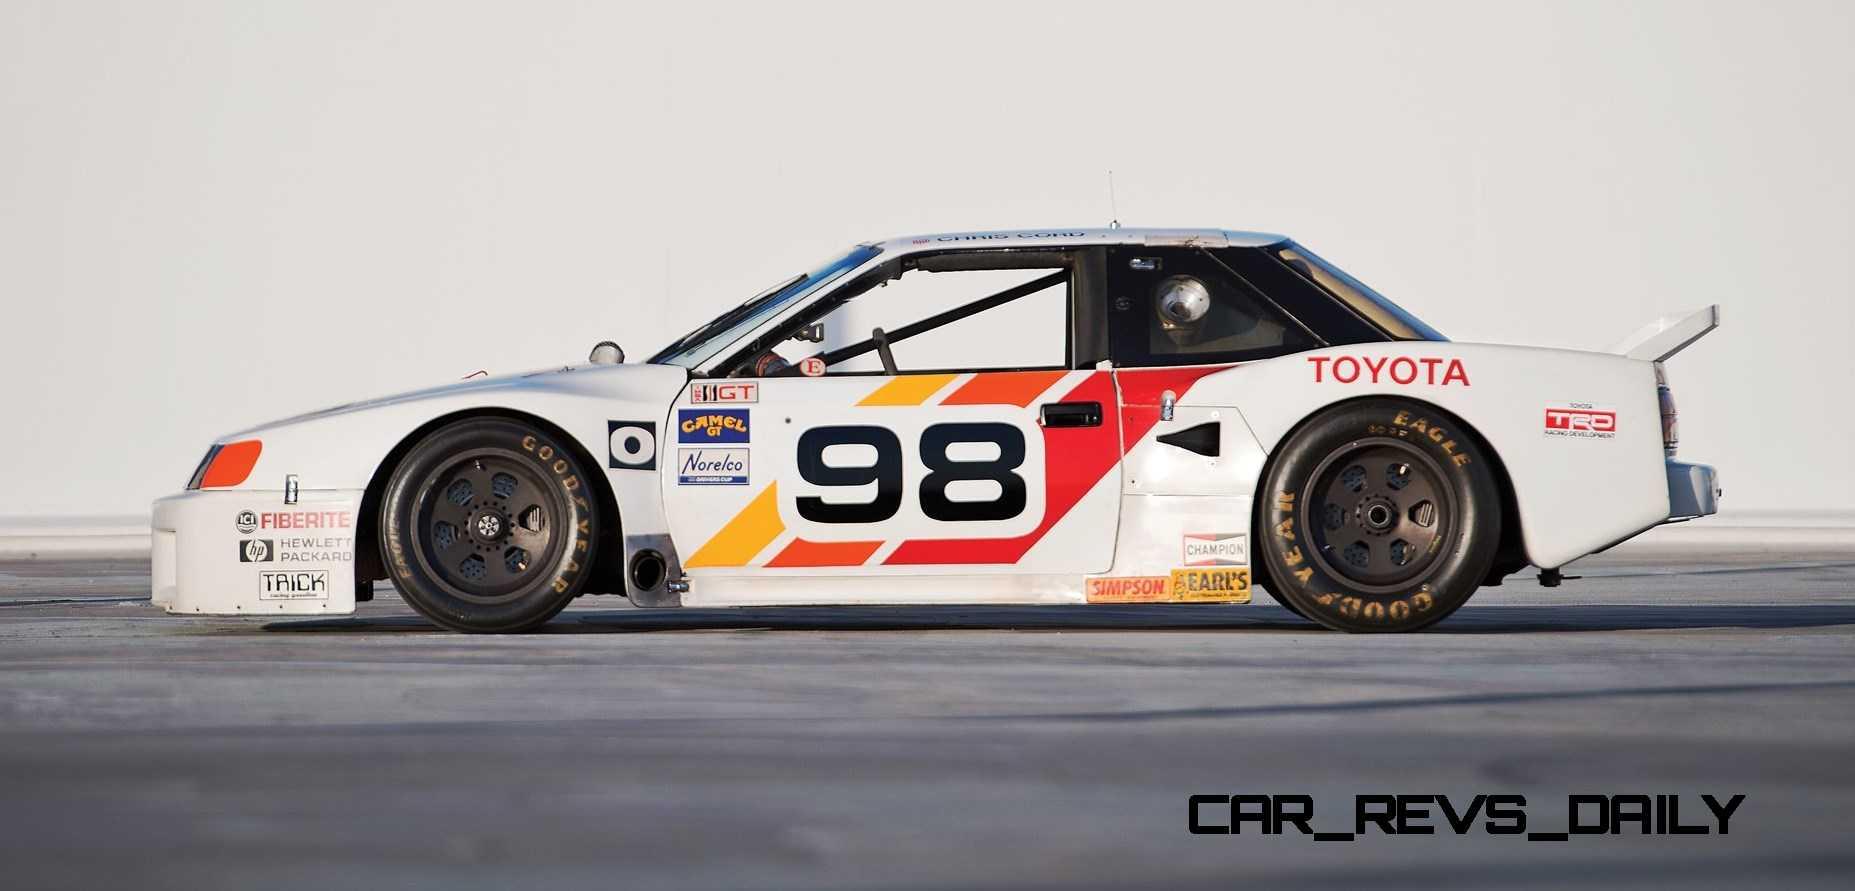 Racing Hero - 1986 Toyota Celica IMSA GTO Is a Rear-Drive Boost-Monster